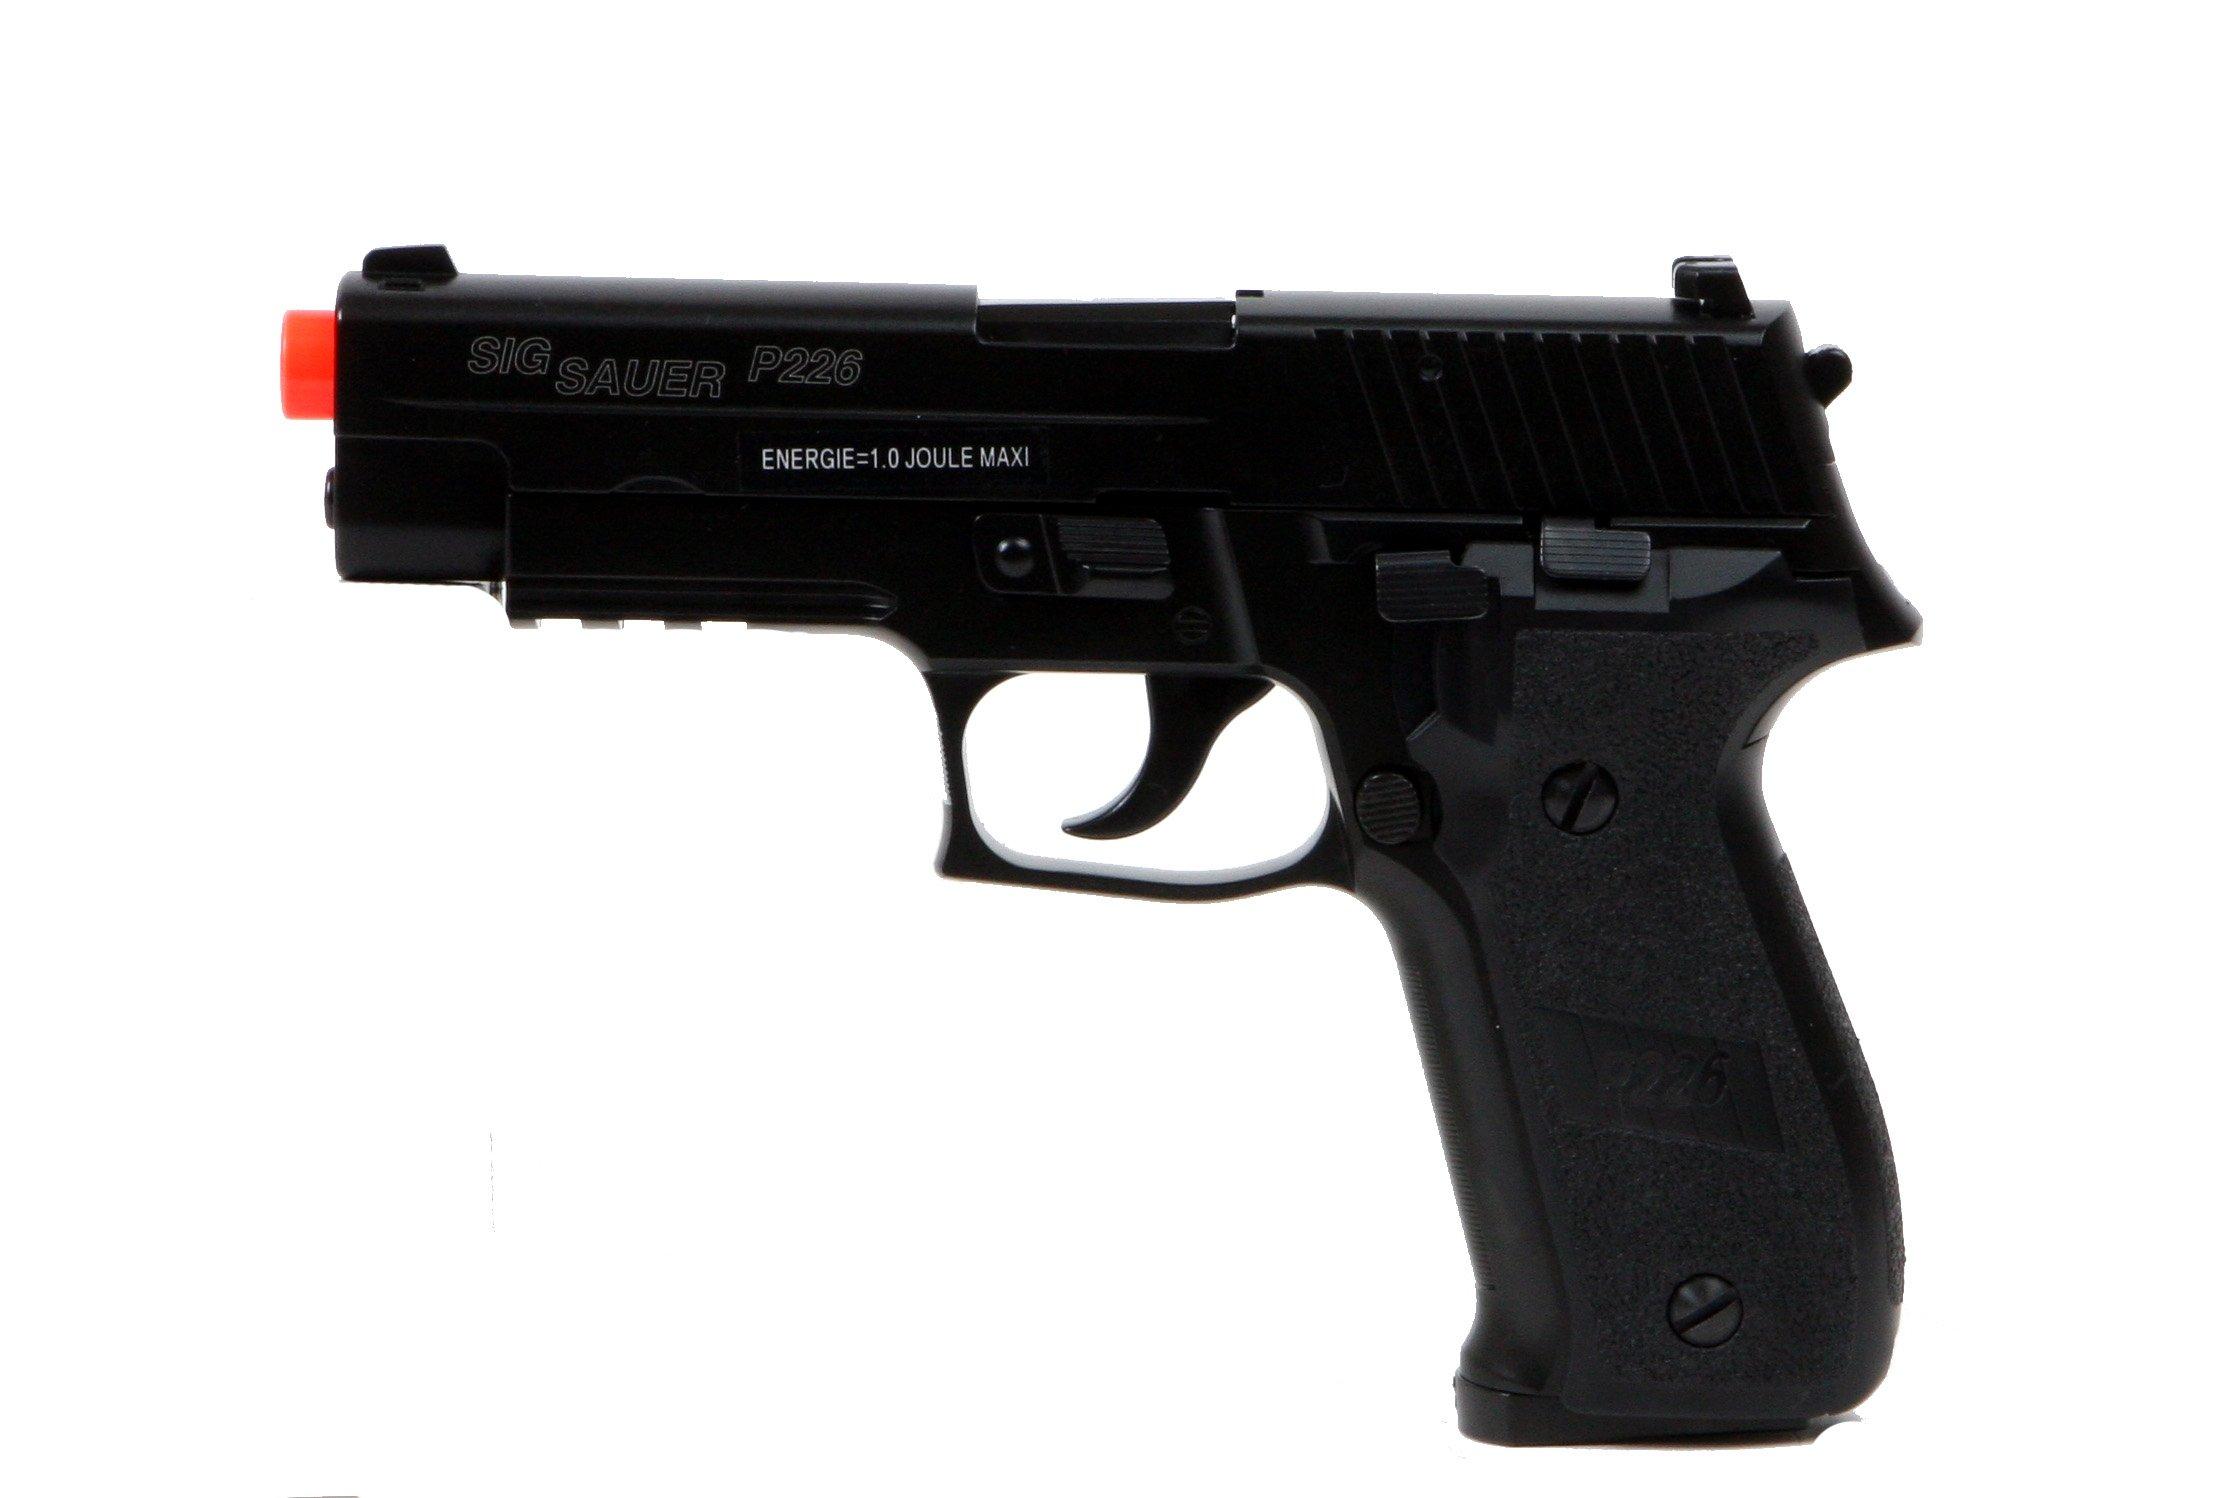 SIG Sauer P226 Full Metal Blow Back Gas Pistol Airsoft Gun